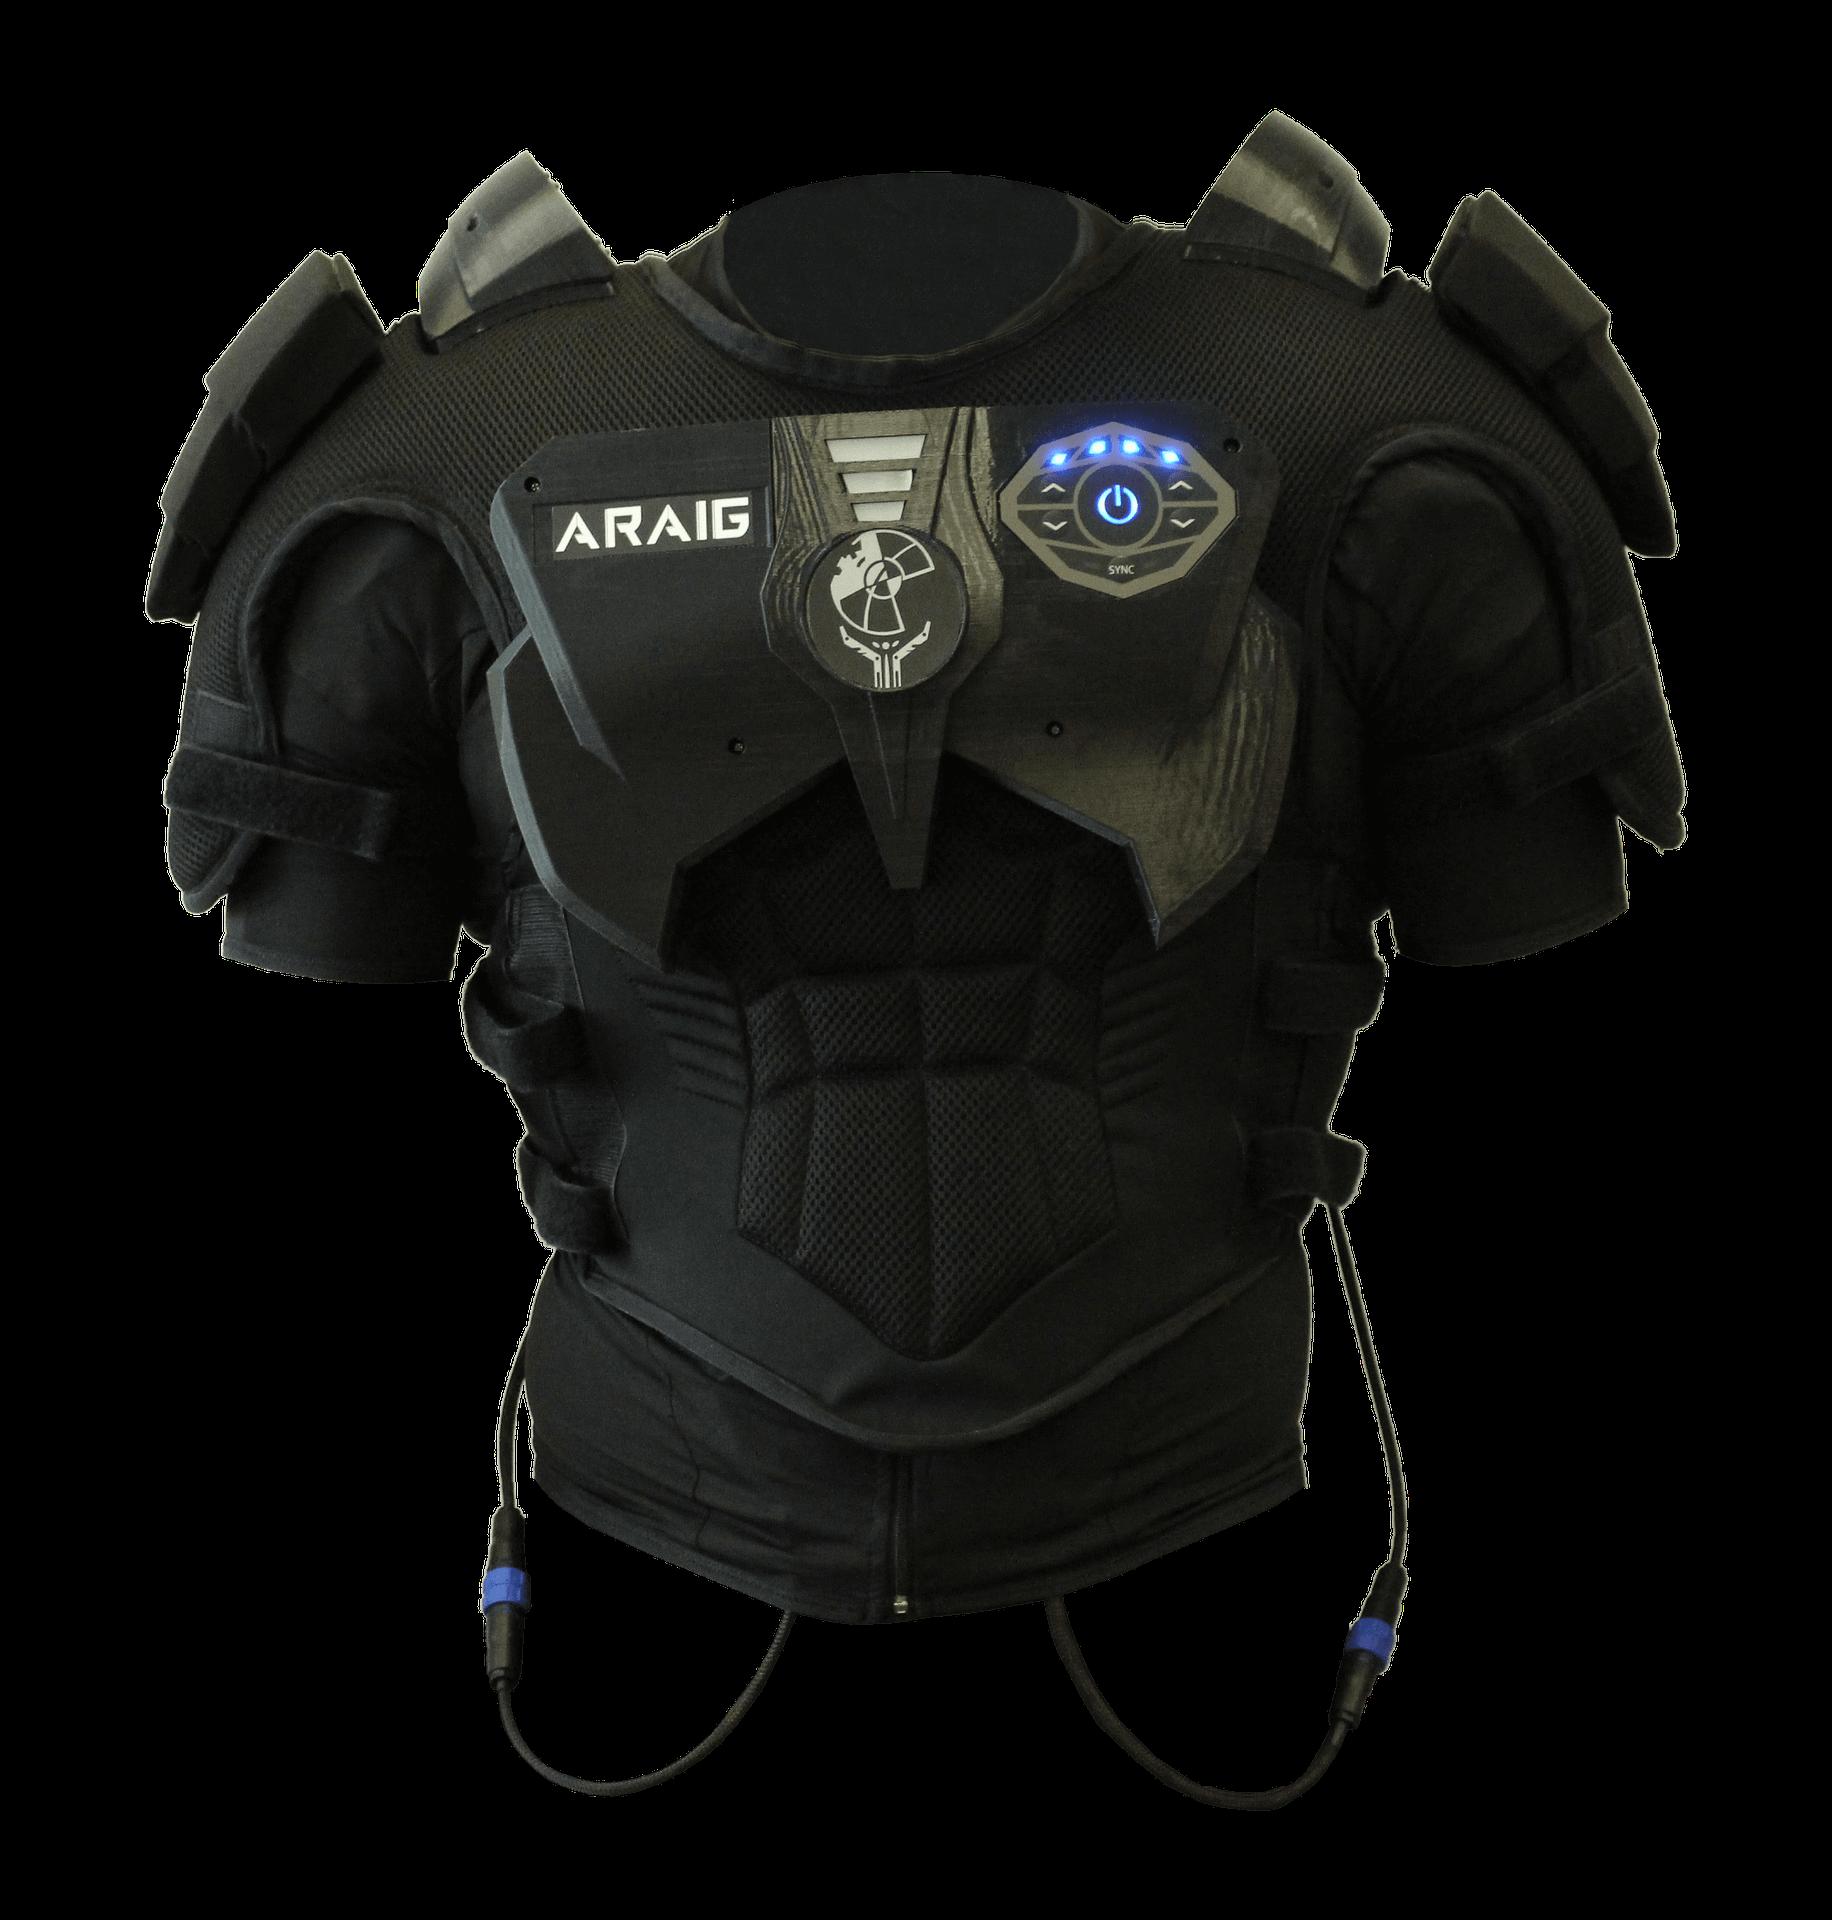 ARAIG vest